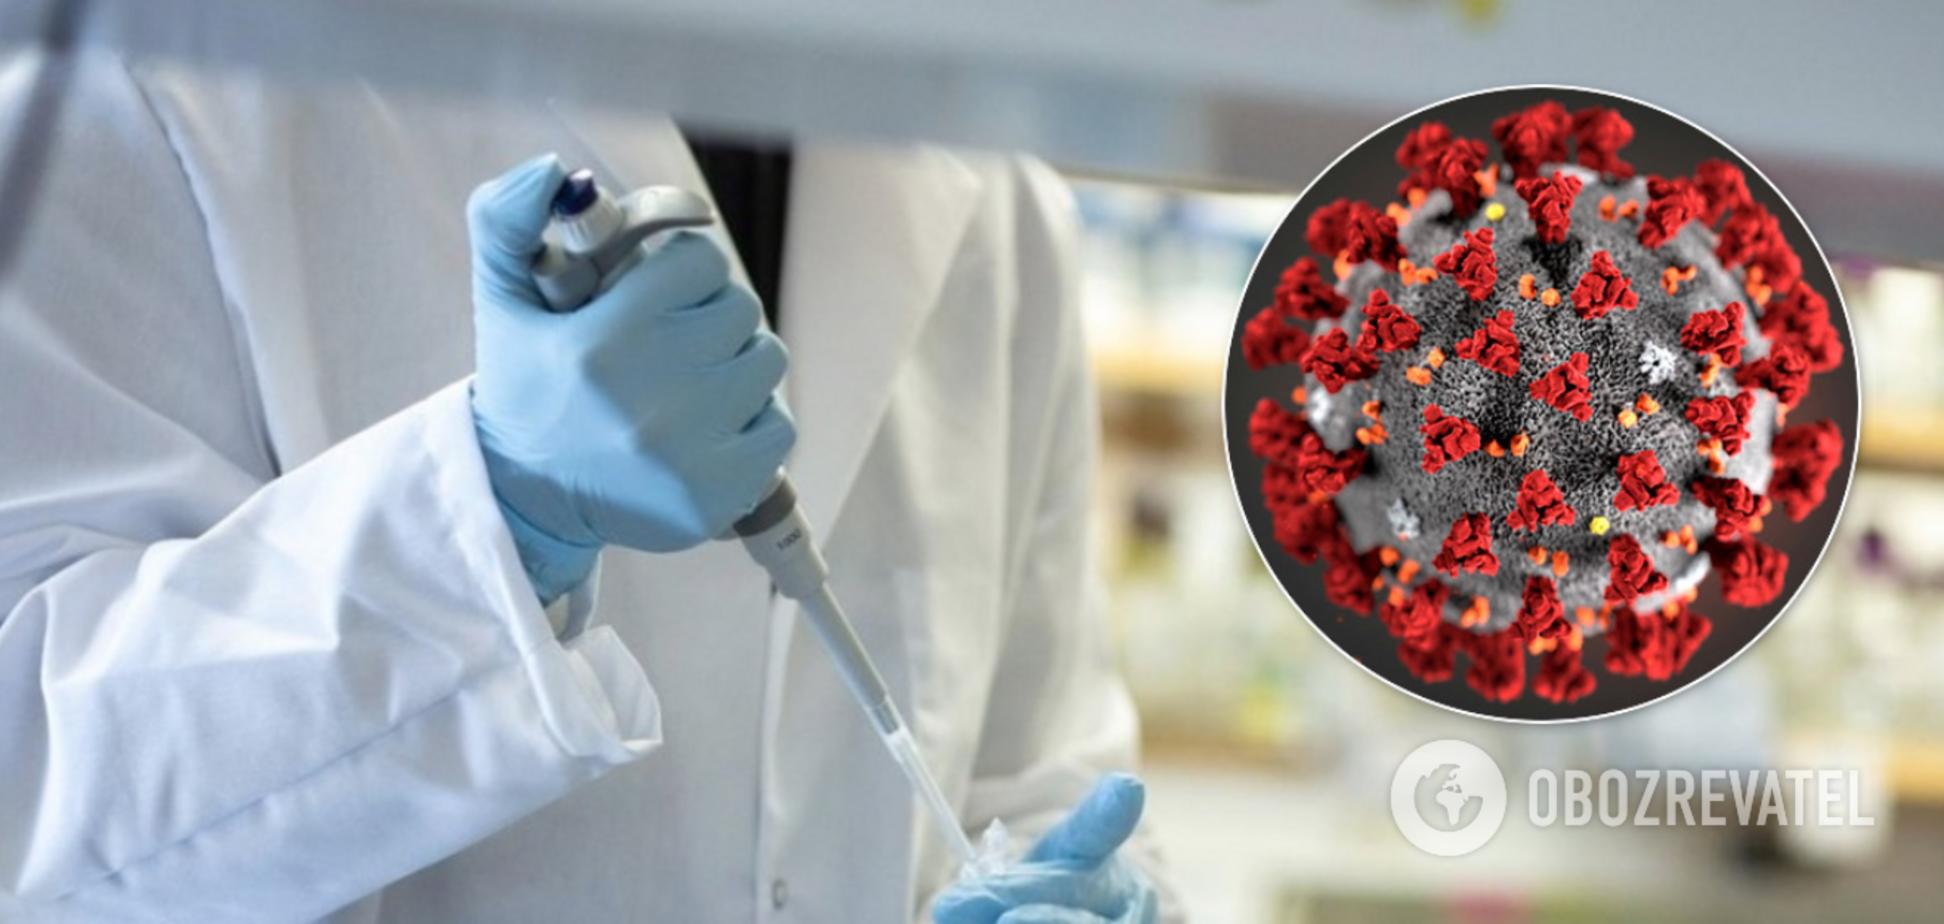 Мир близок к созданию вакцины: статистика по коронавирусу